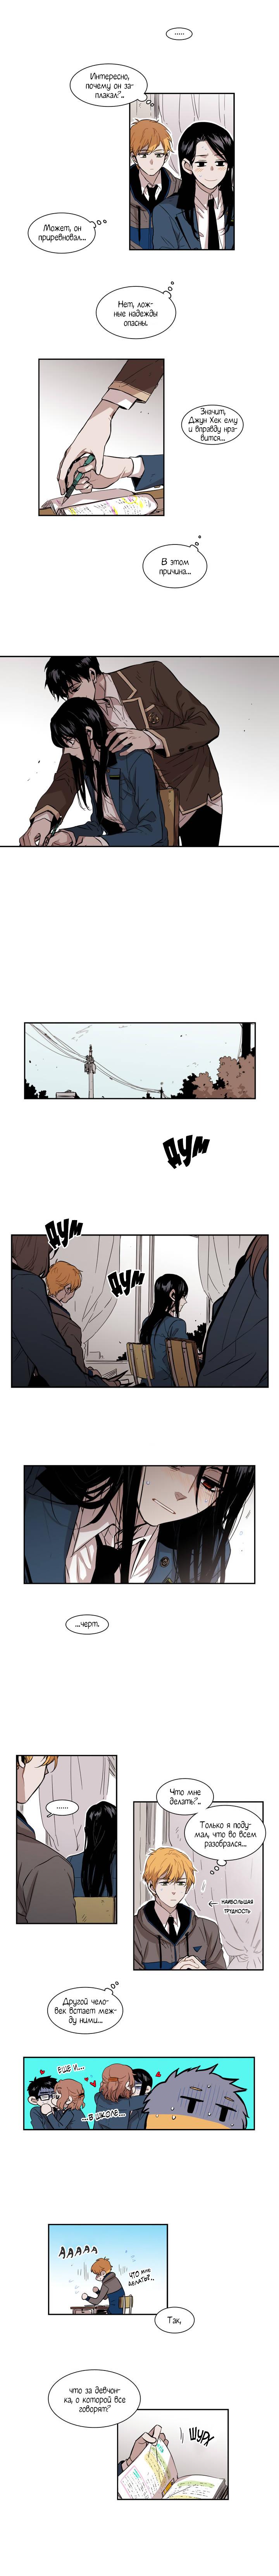 https://r1.ninemanga.com/comics/pic2/24/19800/344189/1511987735372.jpg Page 6